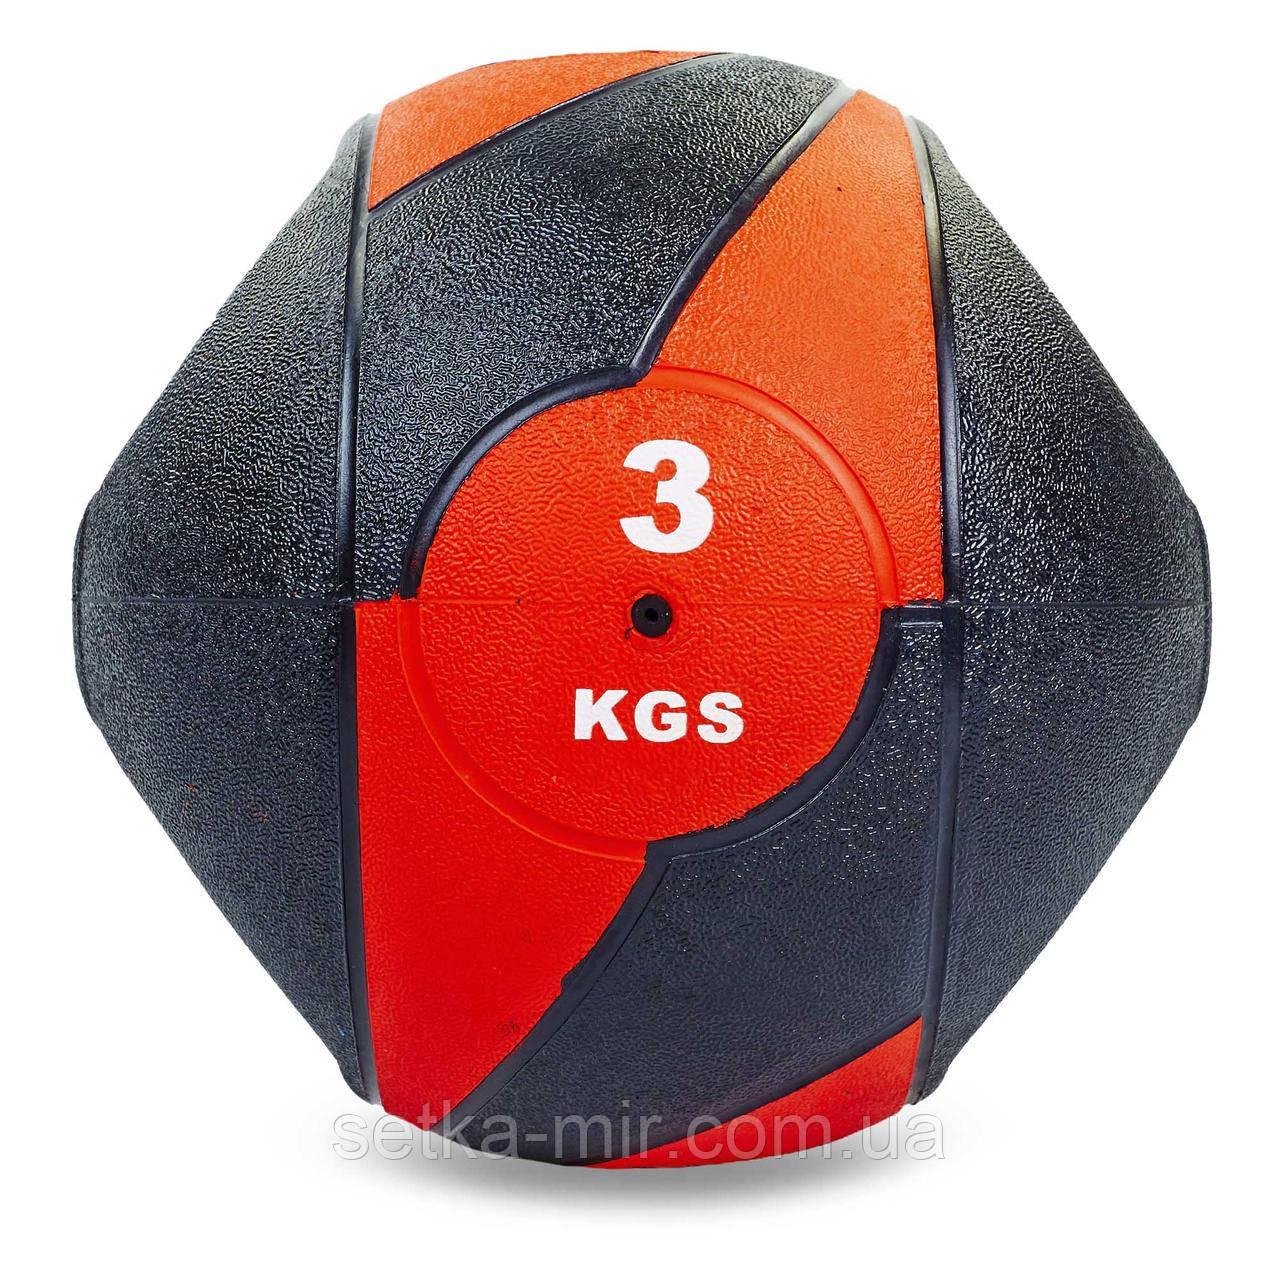 М'яч медичний медбол з двома ручками Record Medicine Ball FI-5111-3 3 кг